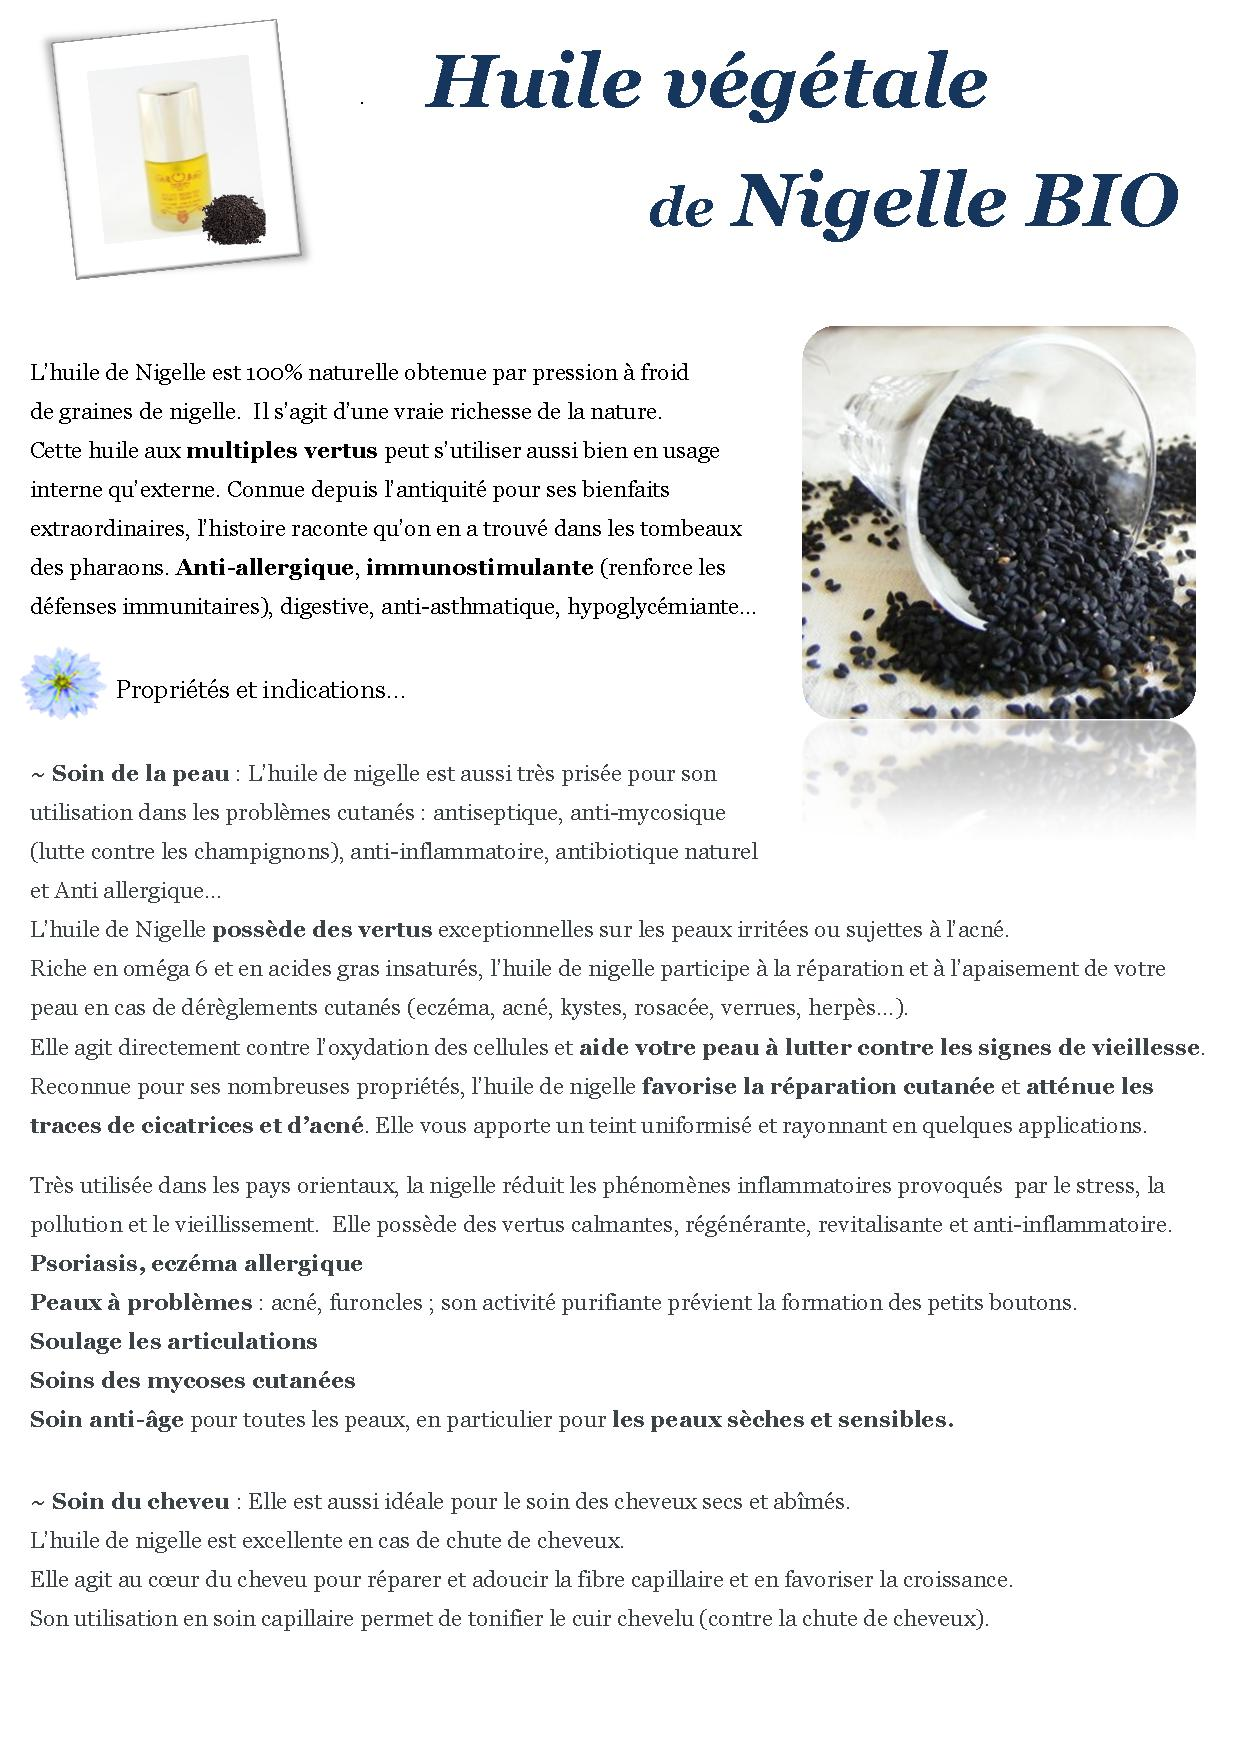 huile de nigelle 1ere pression à froid - nabalsy.com